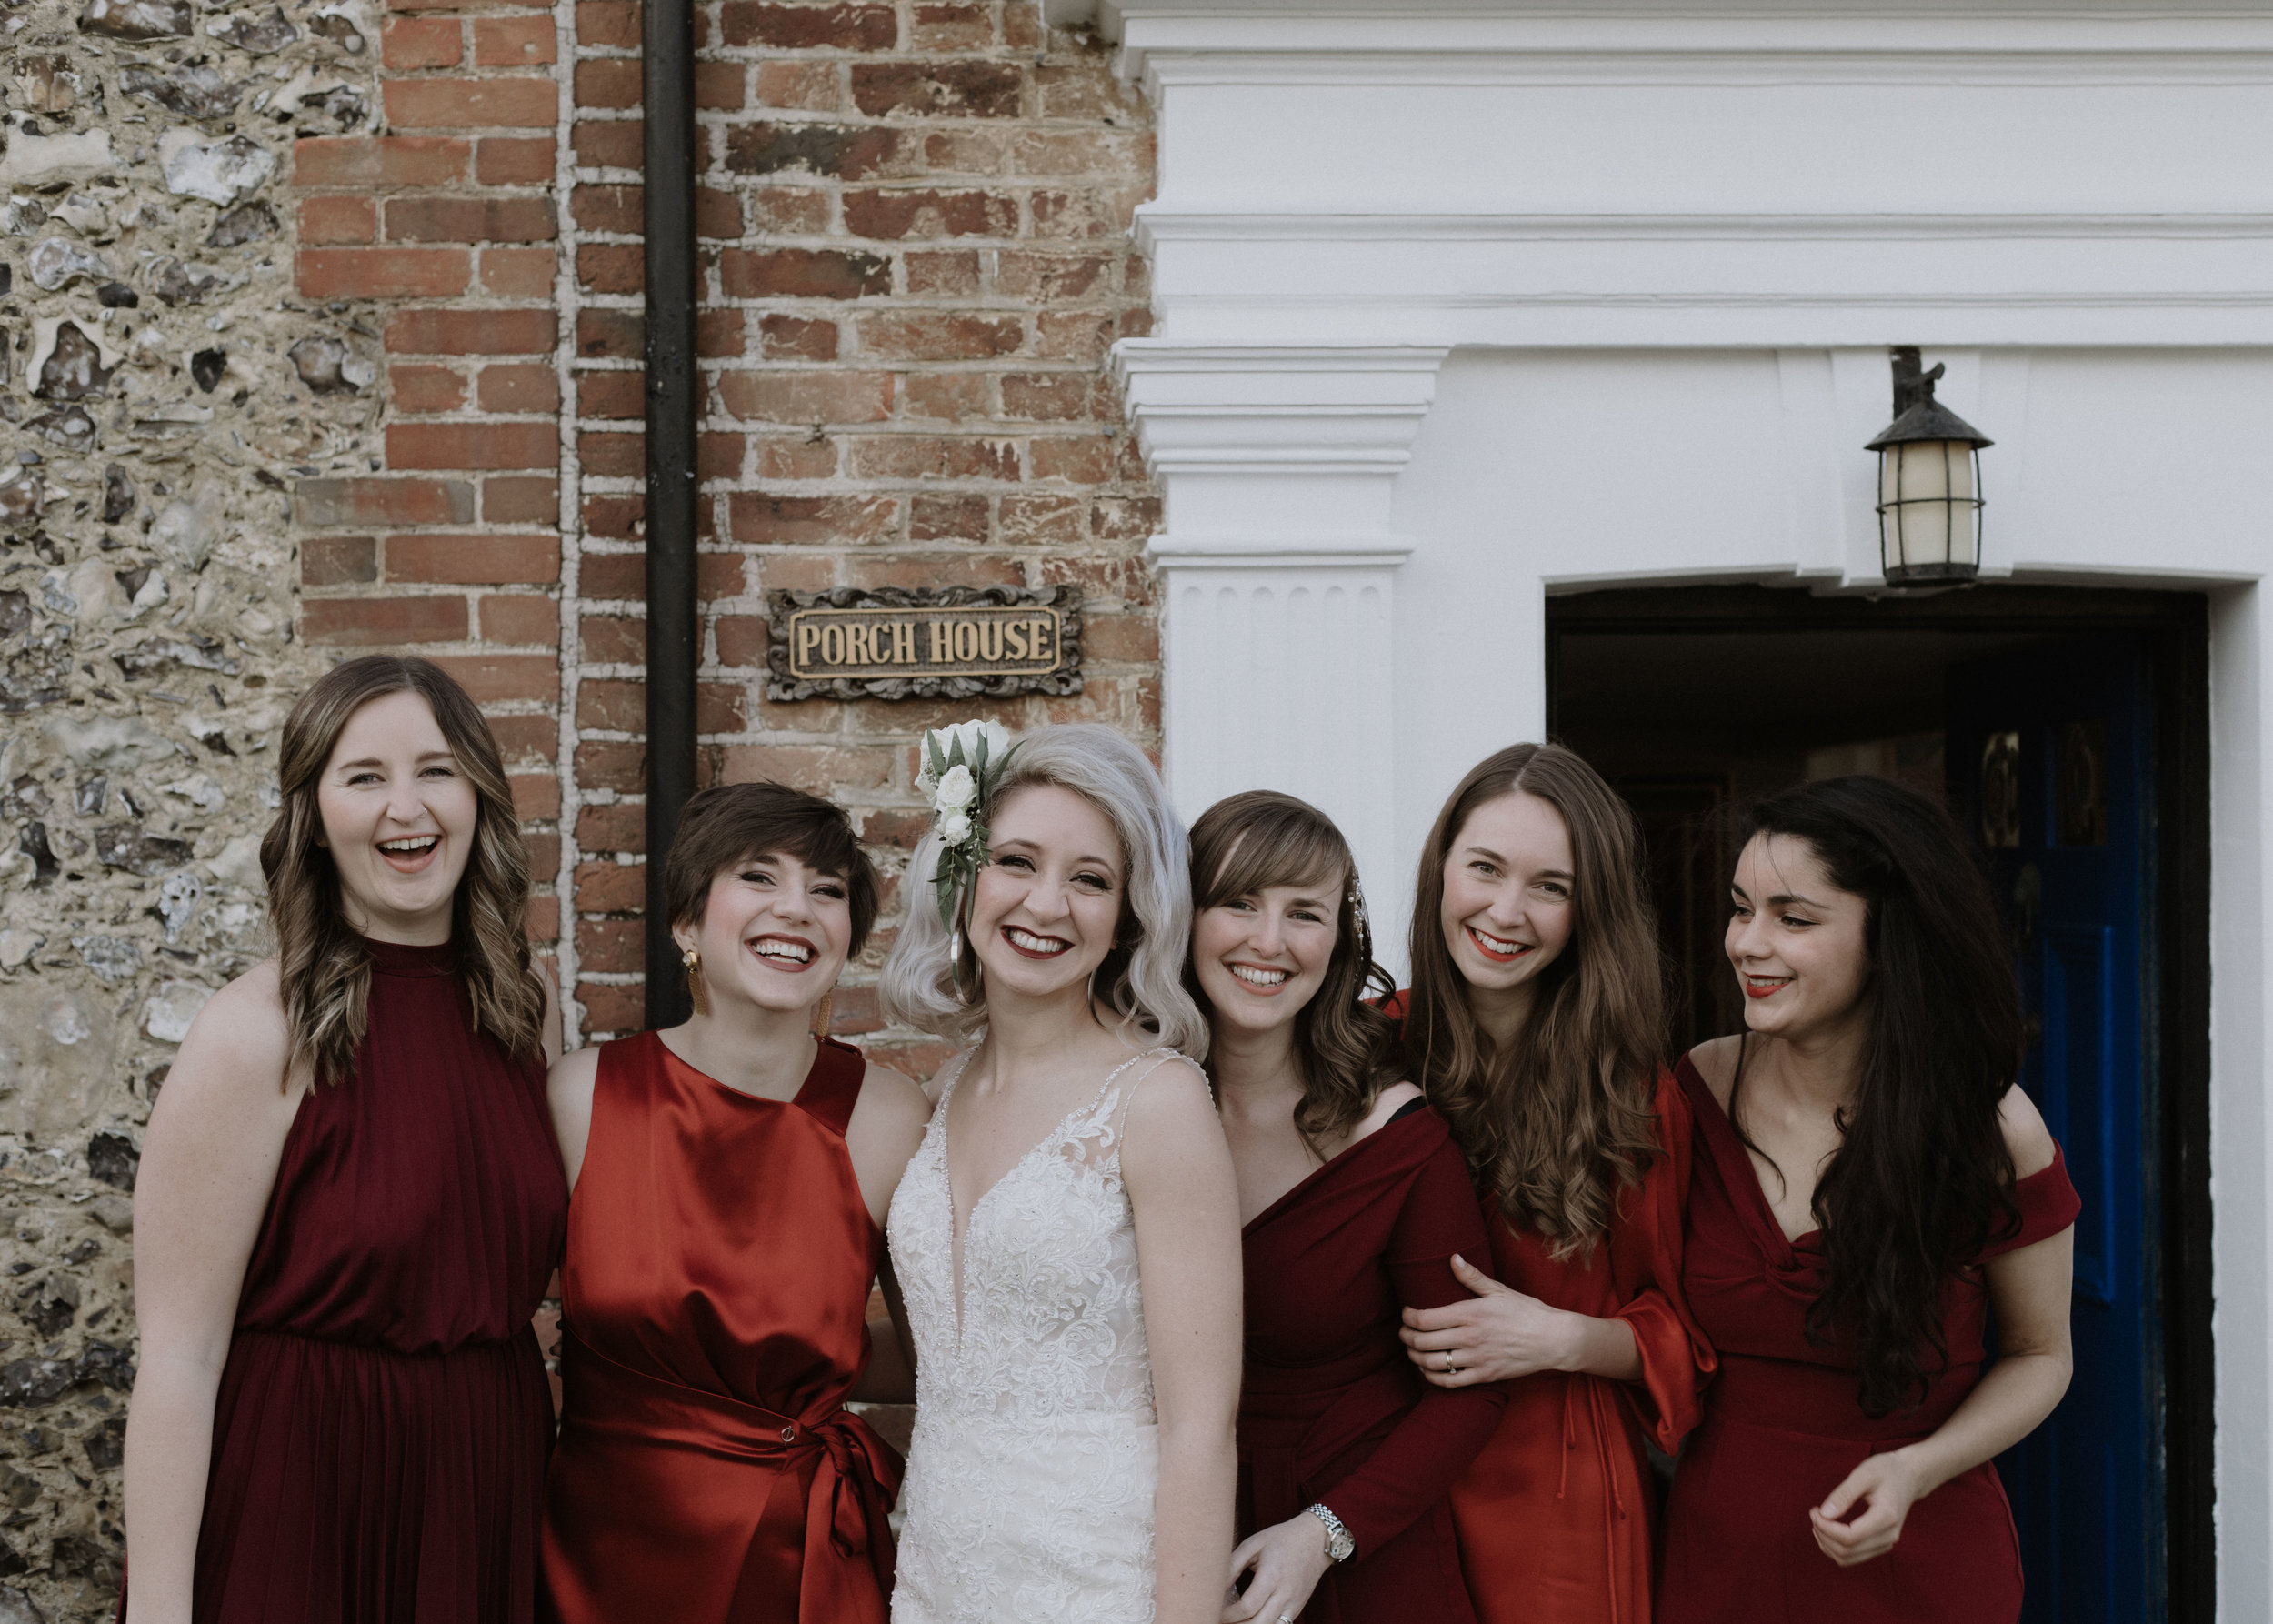 Bridal party - bridesmaids